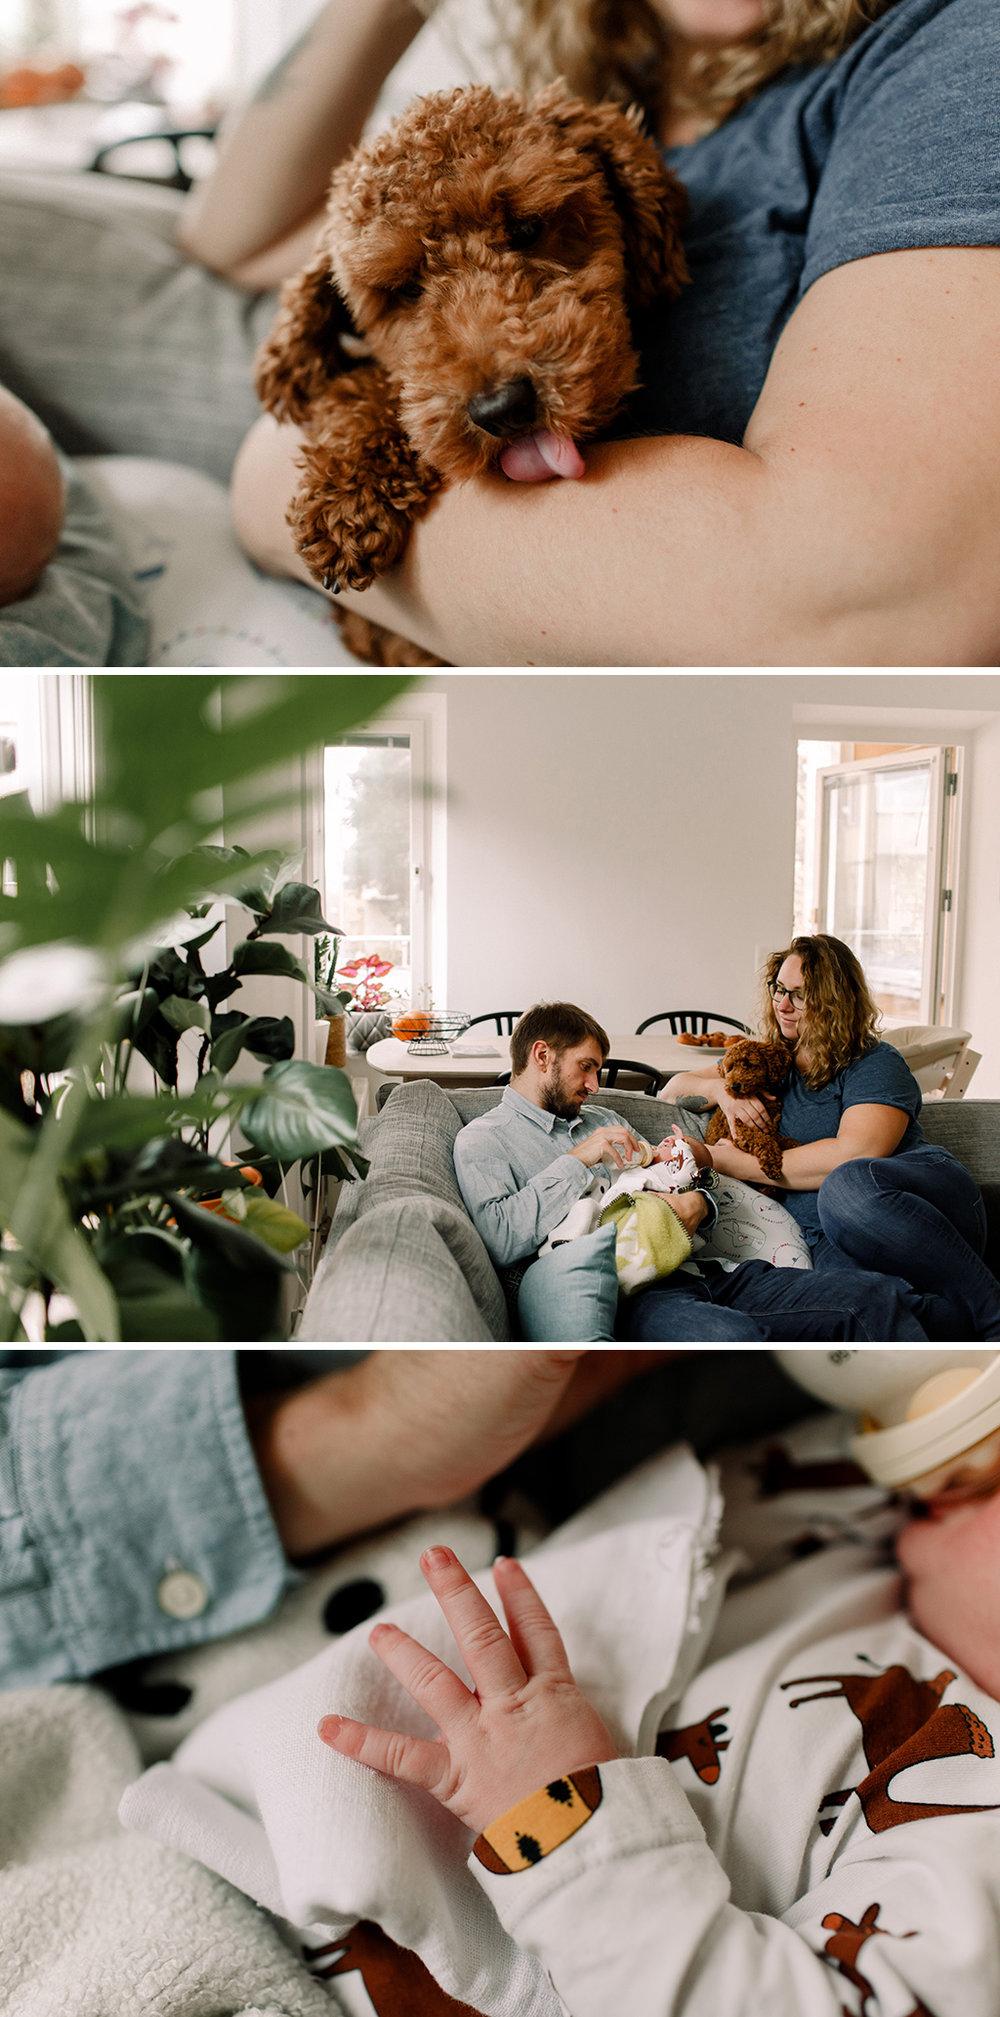 Newborn_Nyfoddfotografering_Stockholm_Familjefotograf_5.jpg